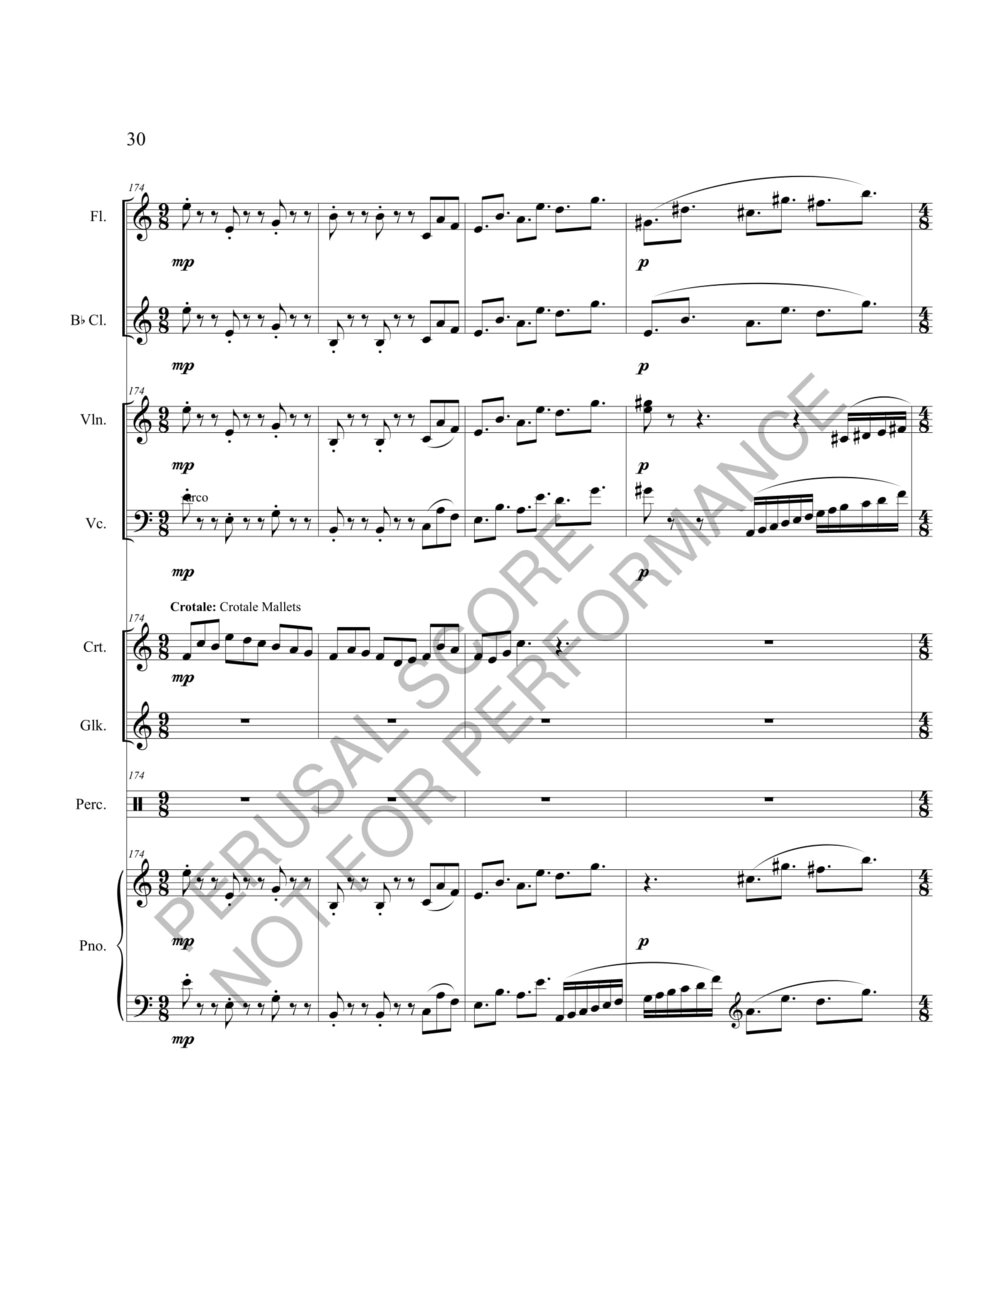 Boyd Terra Liberi Score-watermark-36.jpg